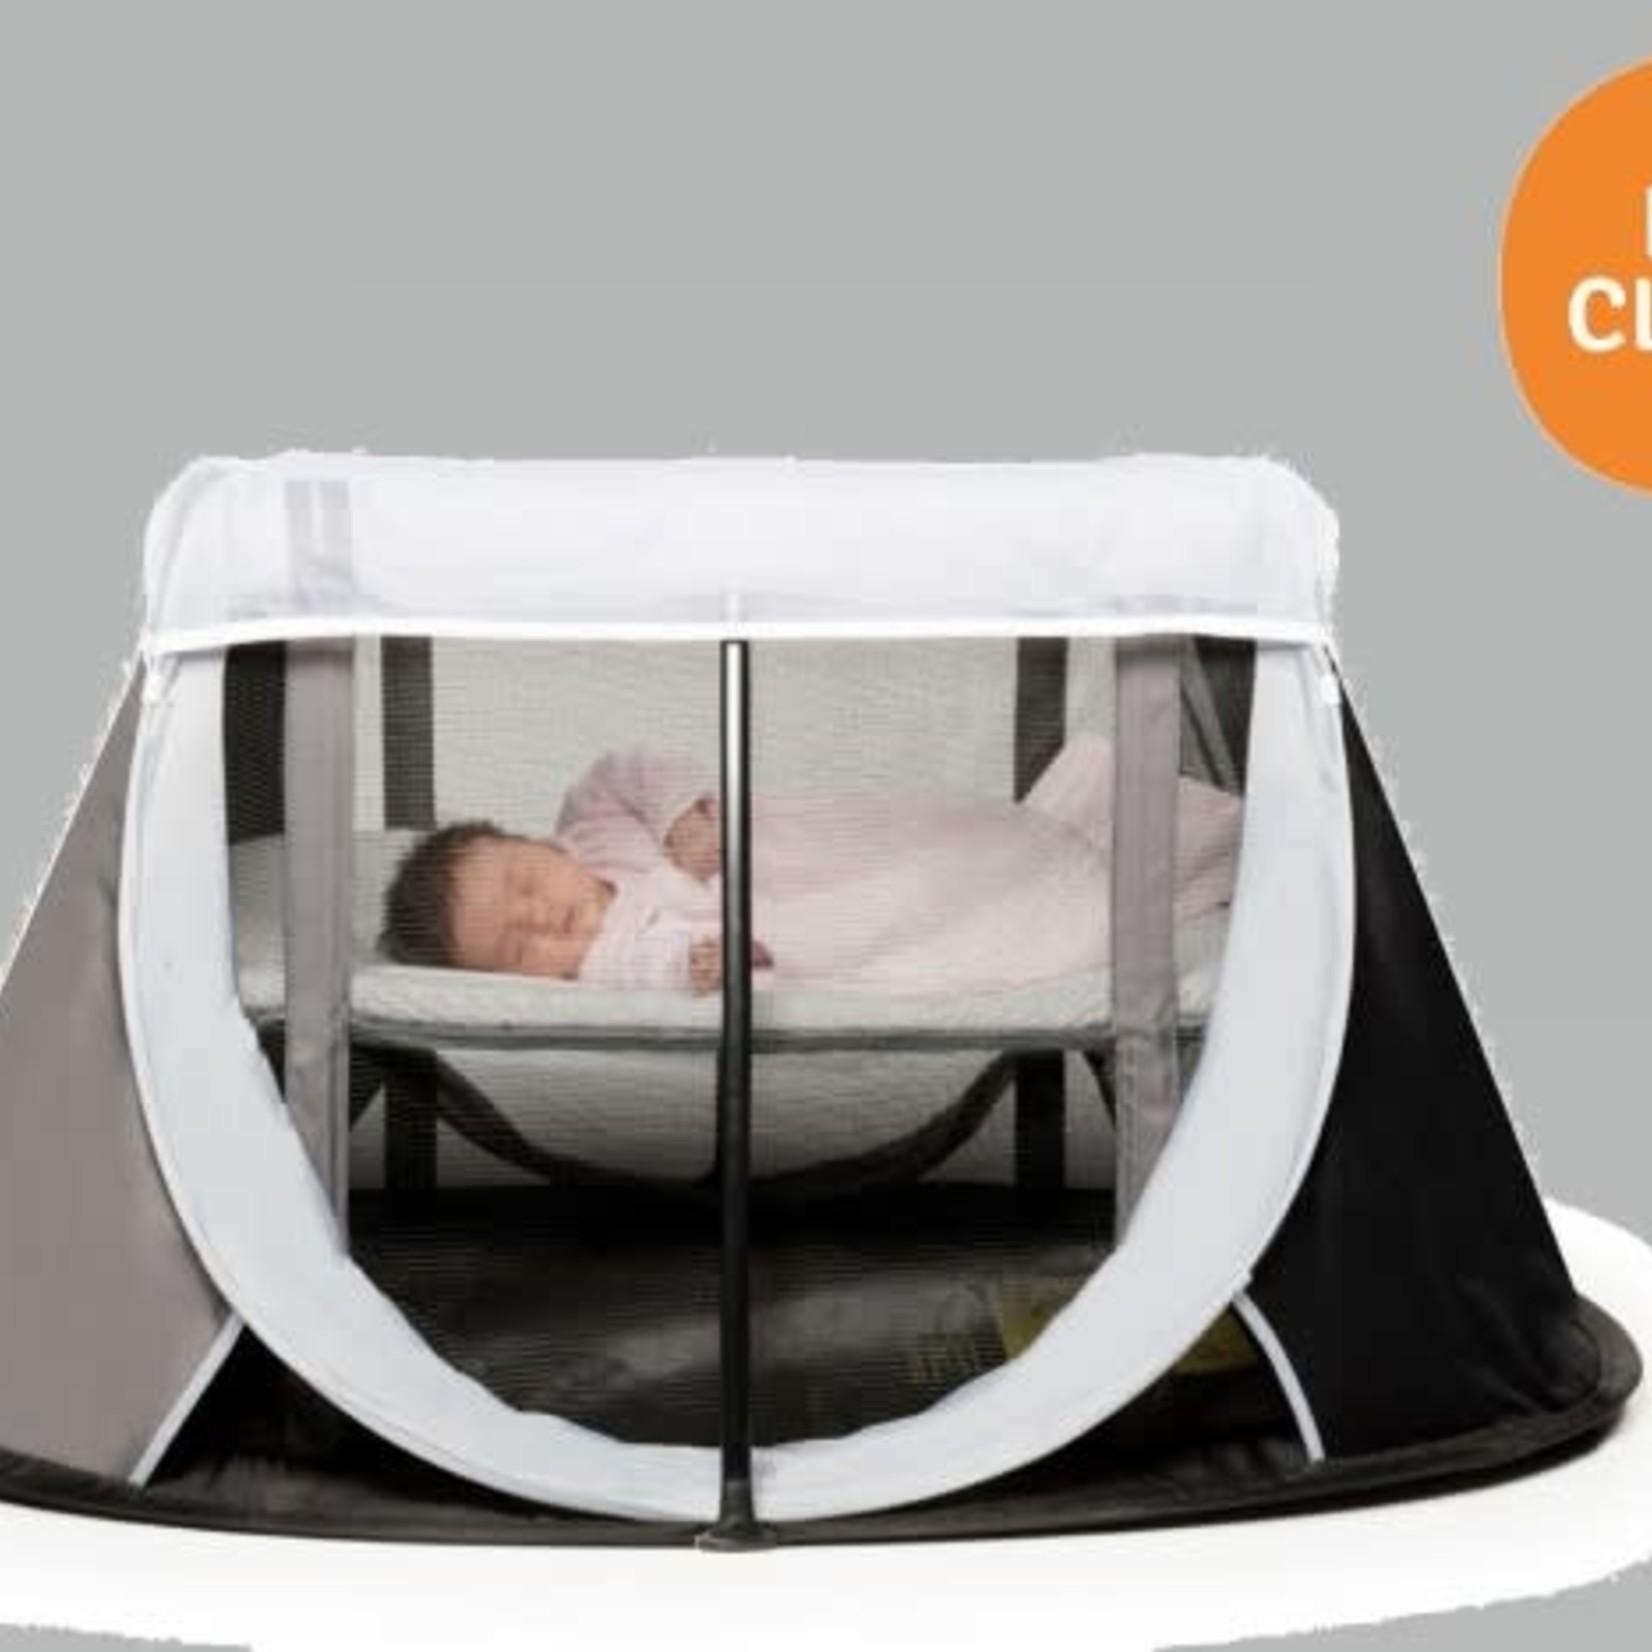 AeroMoov Instant travel cot - Mosquito net